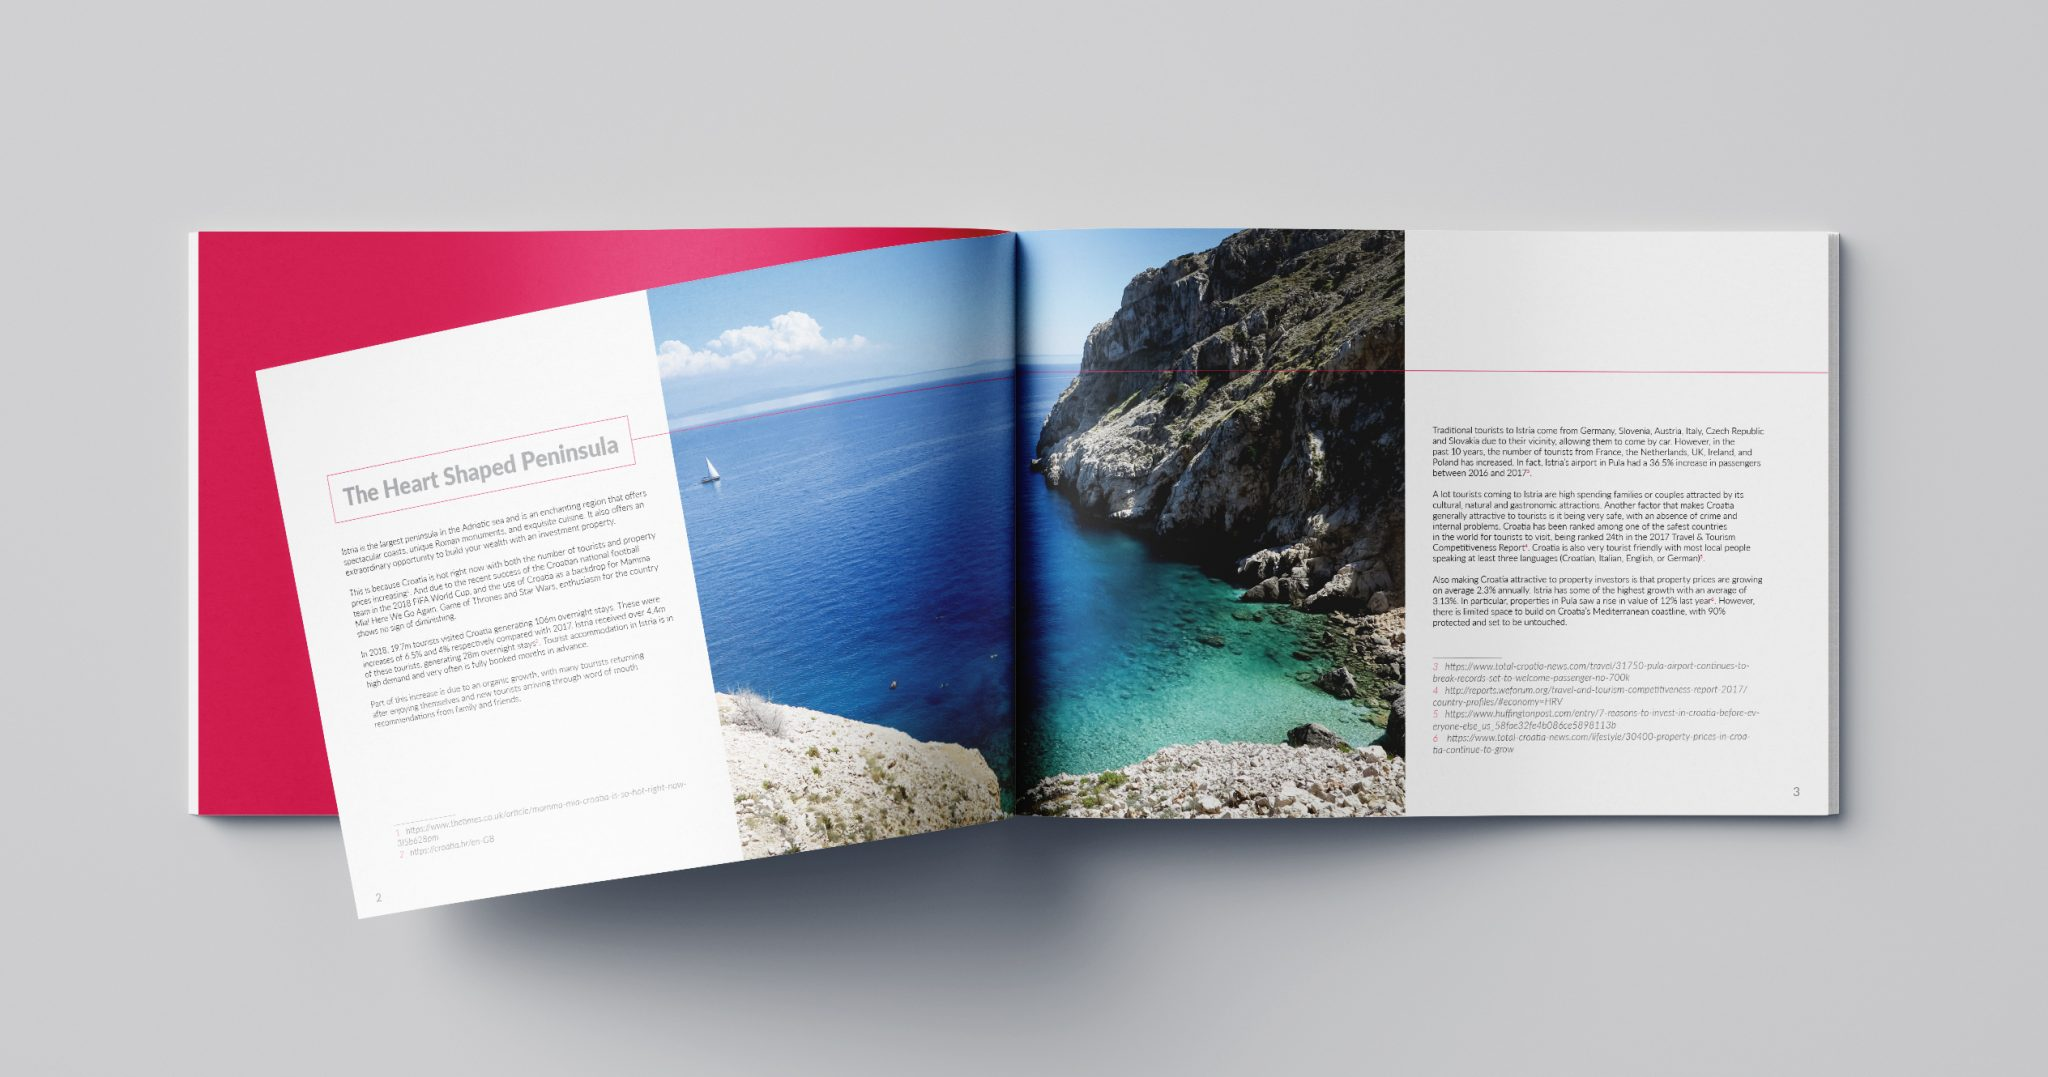 candy-brick-catalogue-design-spread